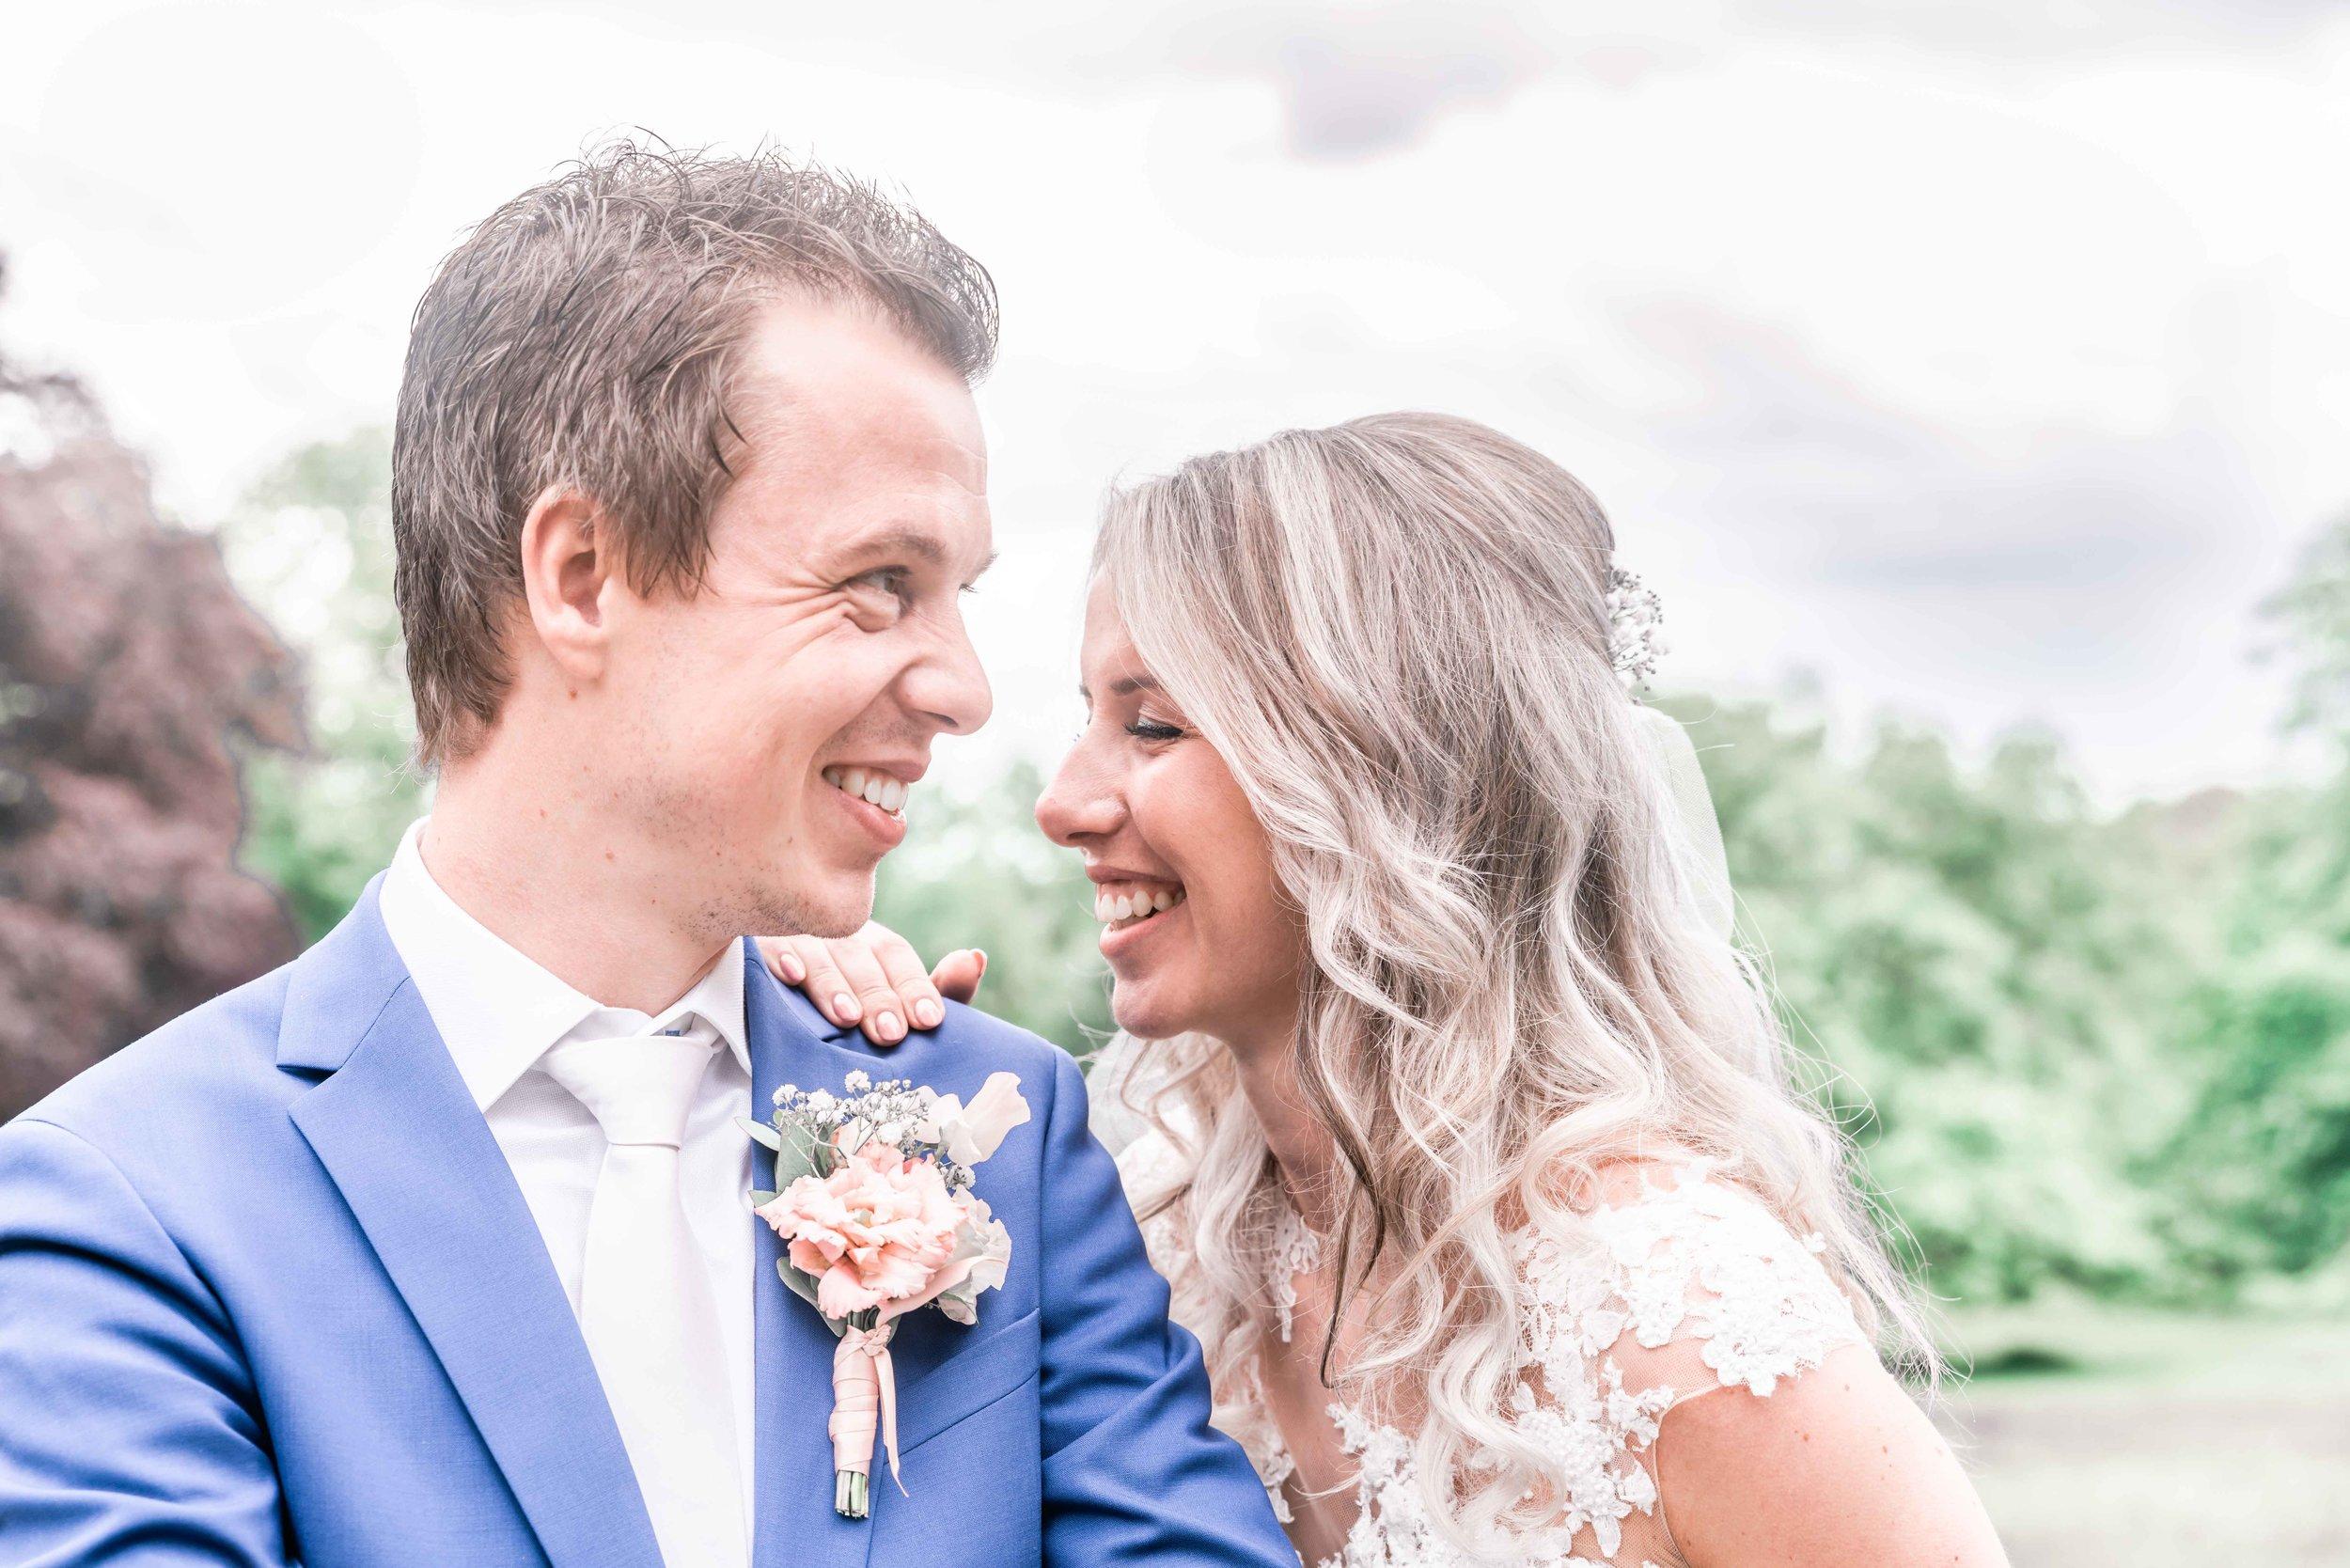 trouwfotograaf - lichte trouwfoto's - bruidreportage ede arnhem amersfoort